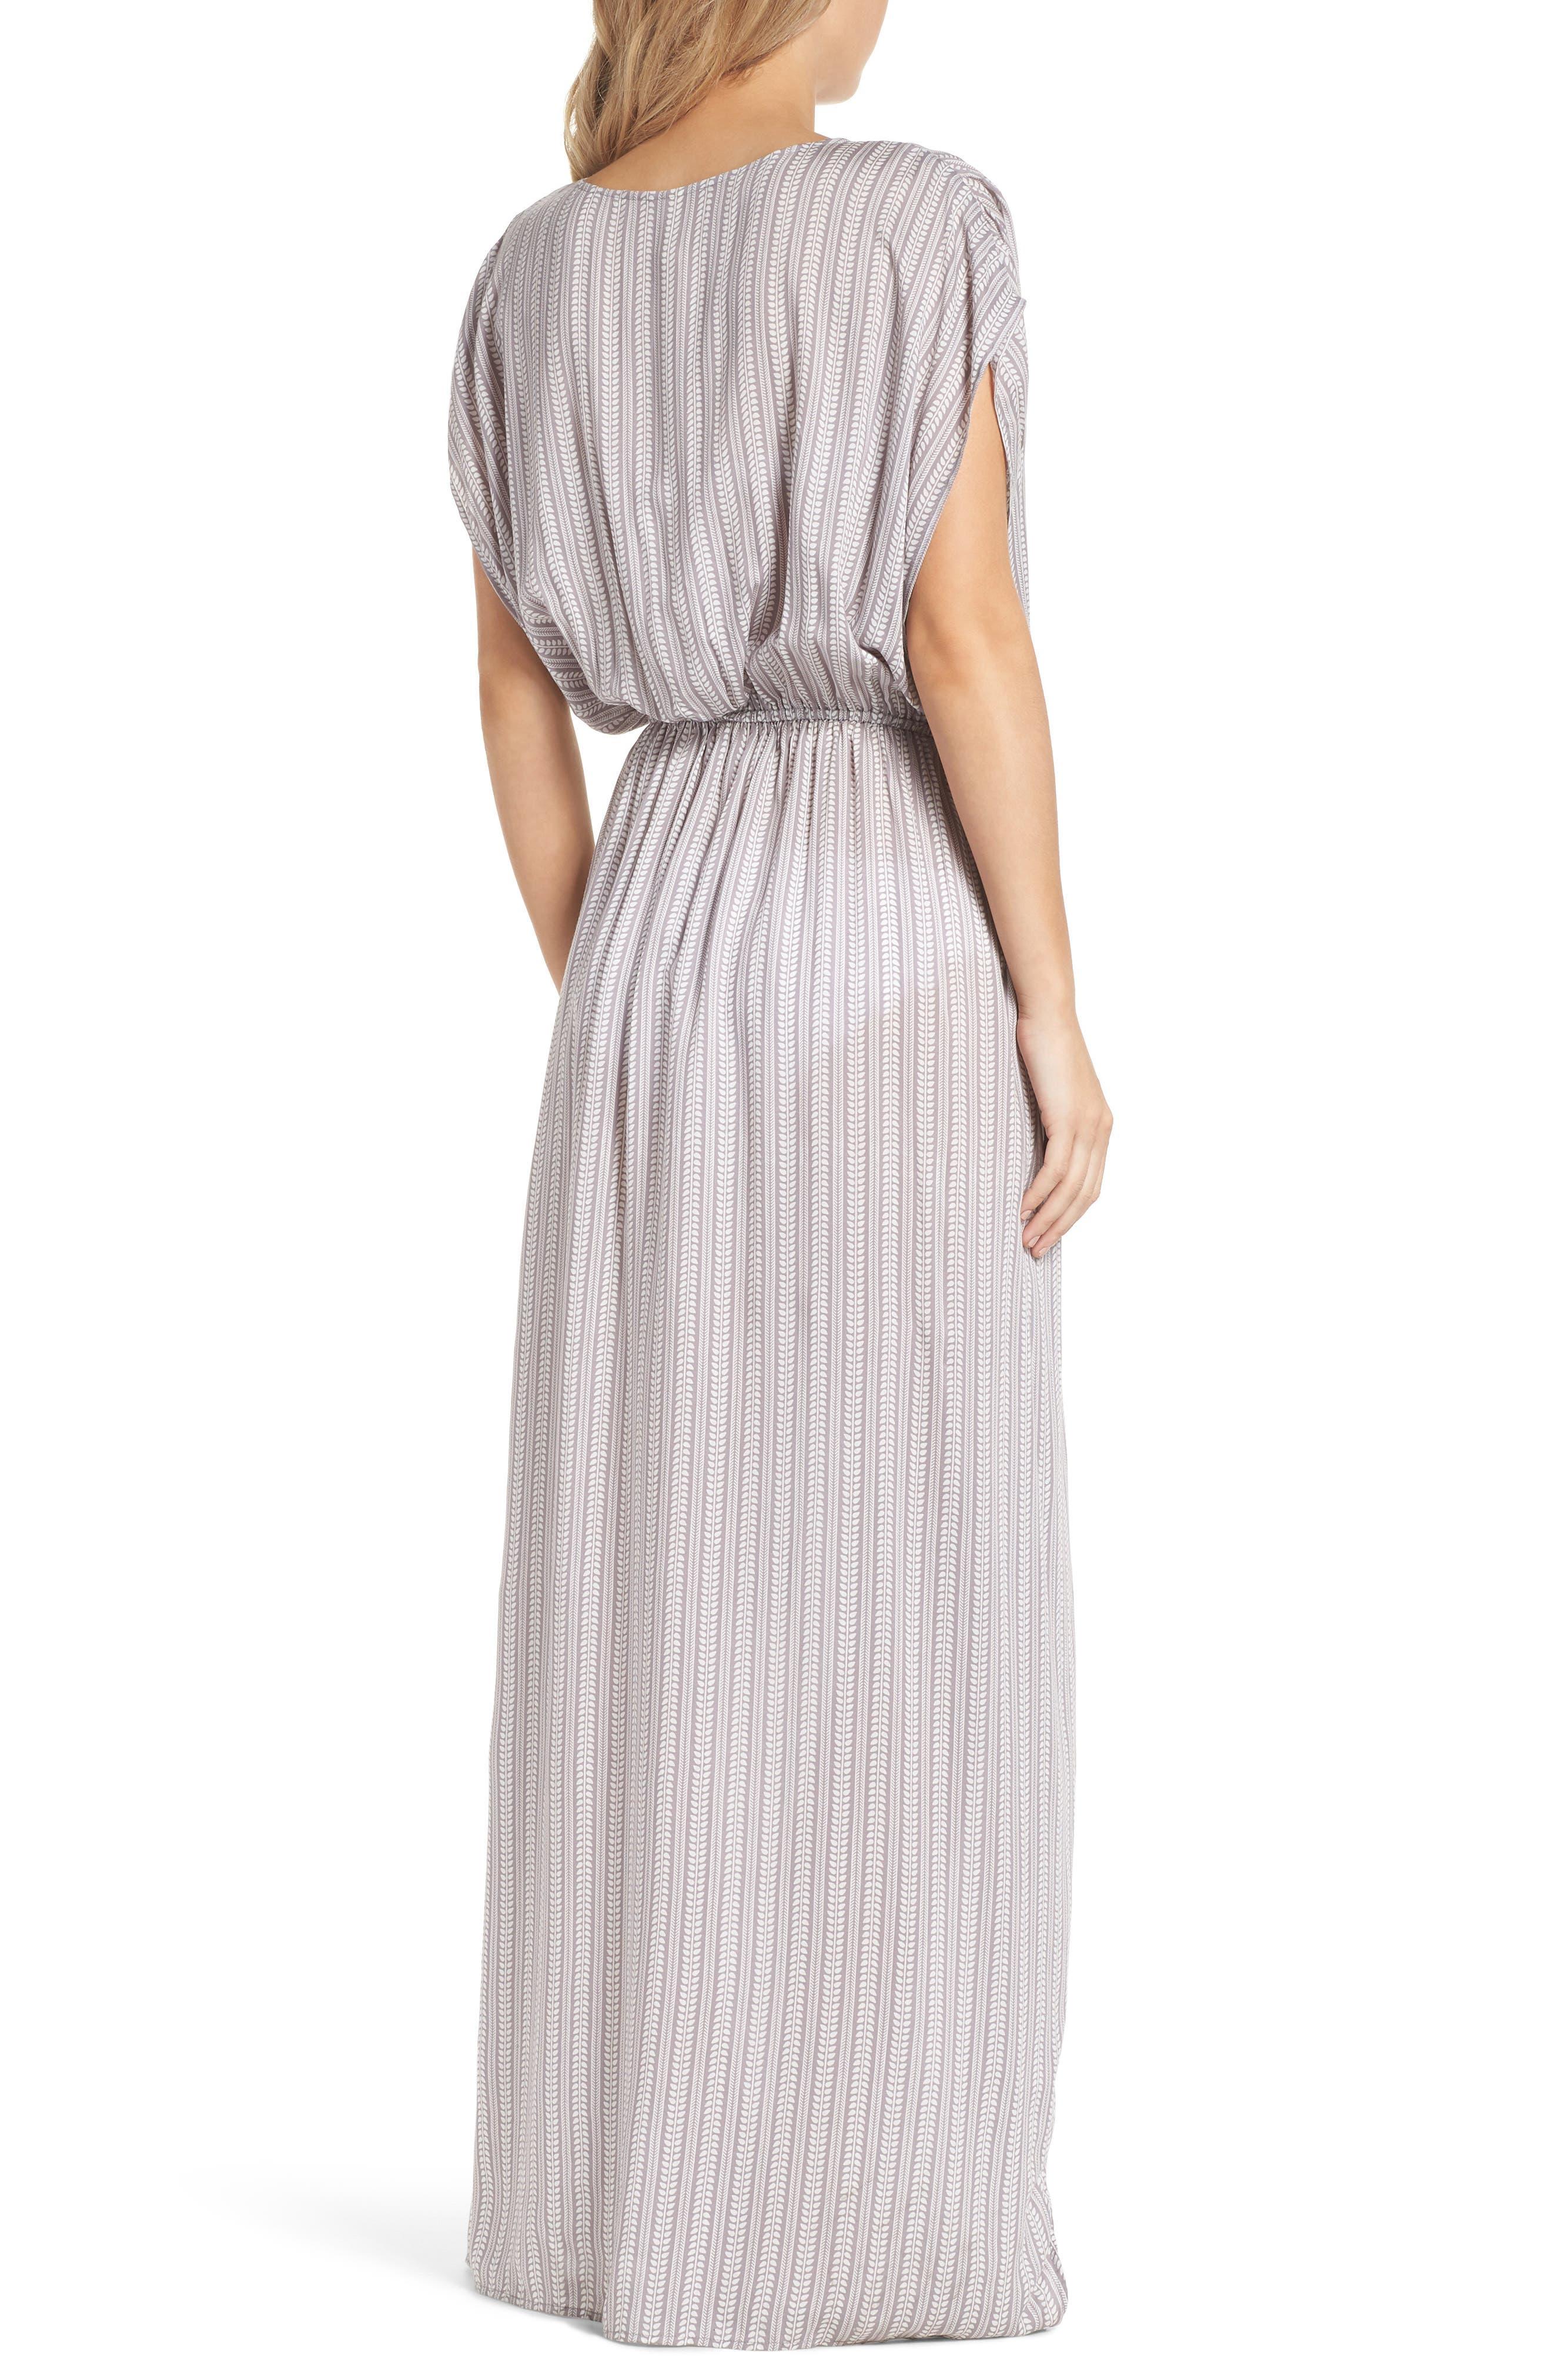 Wrap Maxi Cover-Up Dress,                             Alternate thumbnail 3, color,